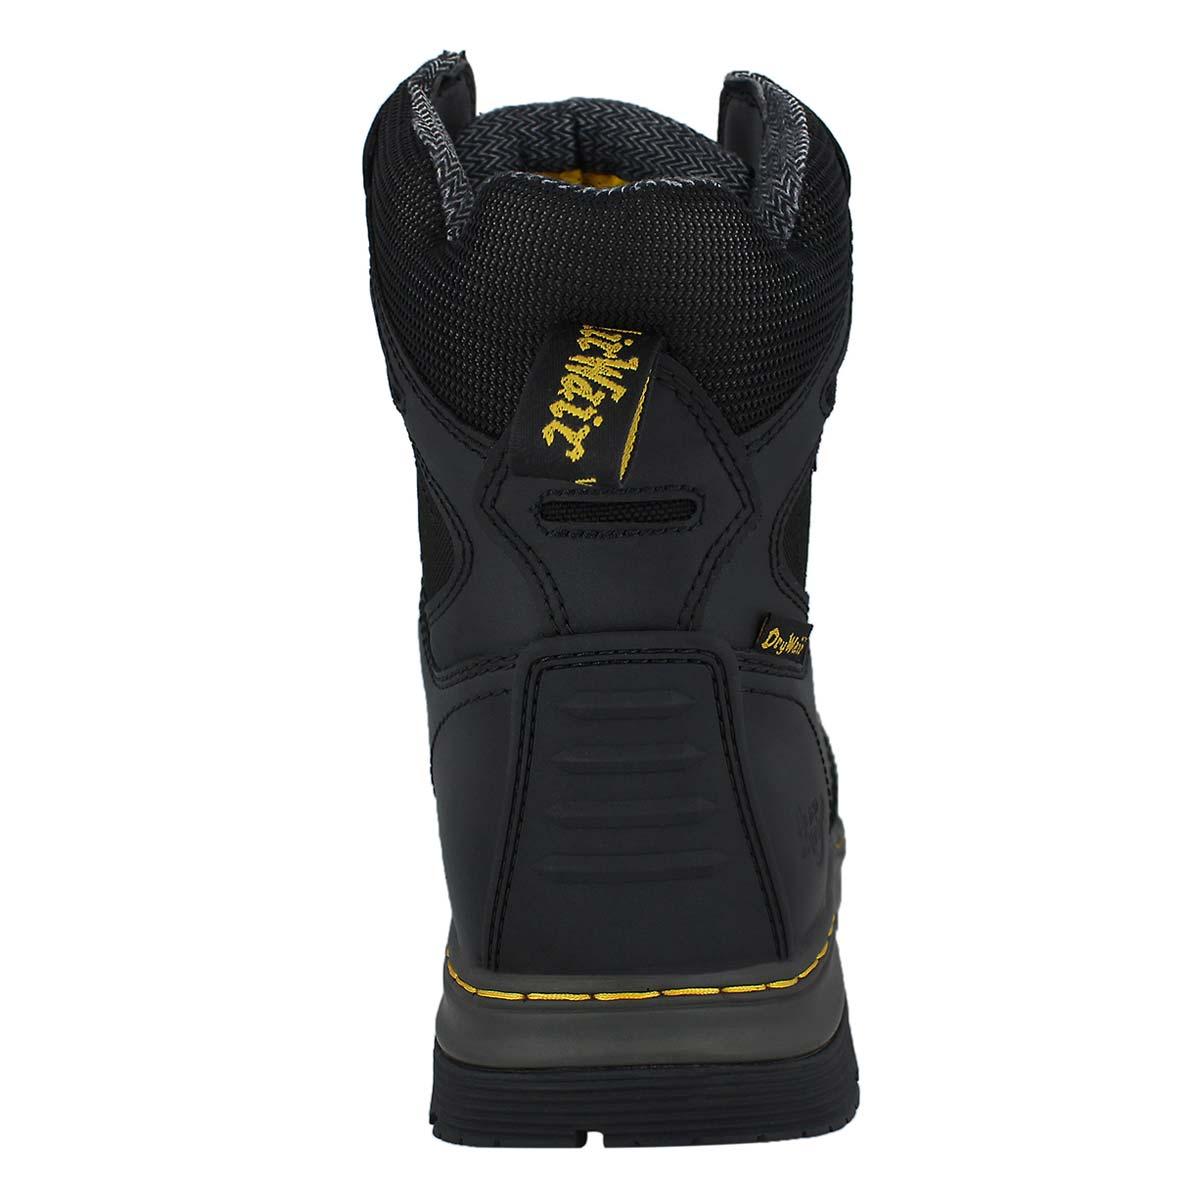 Mns Torrent ST blk CSA wtpf safety boot